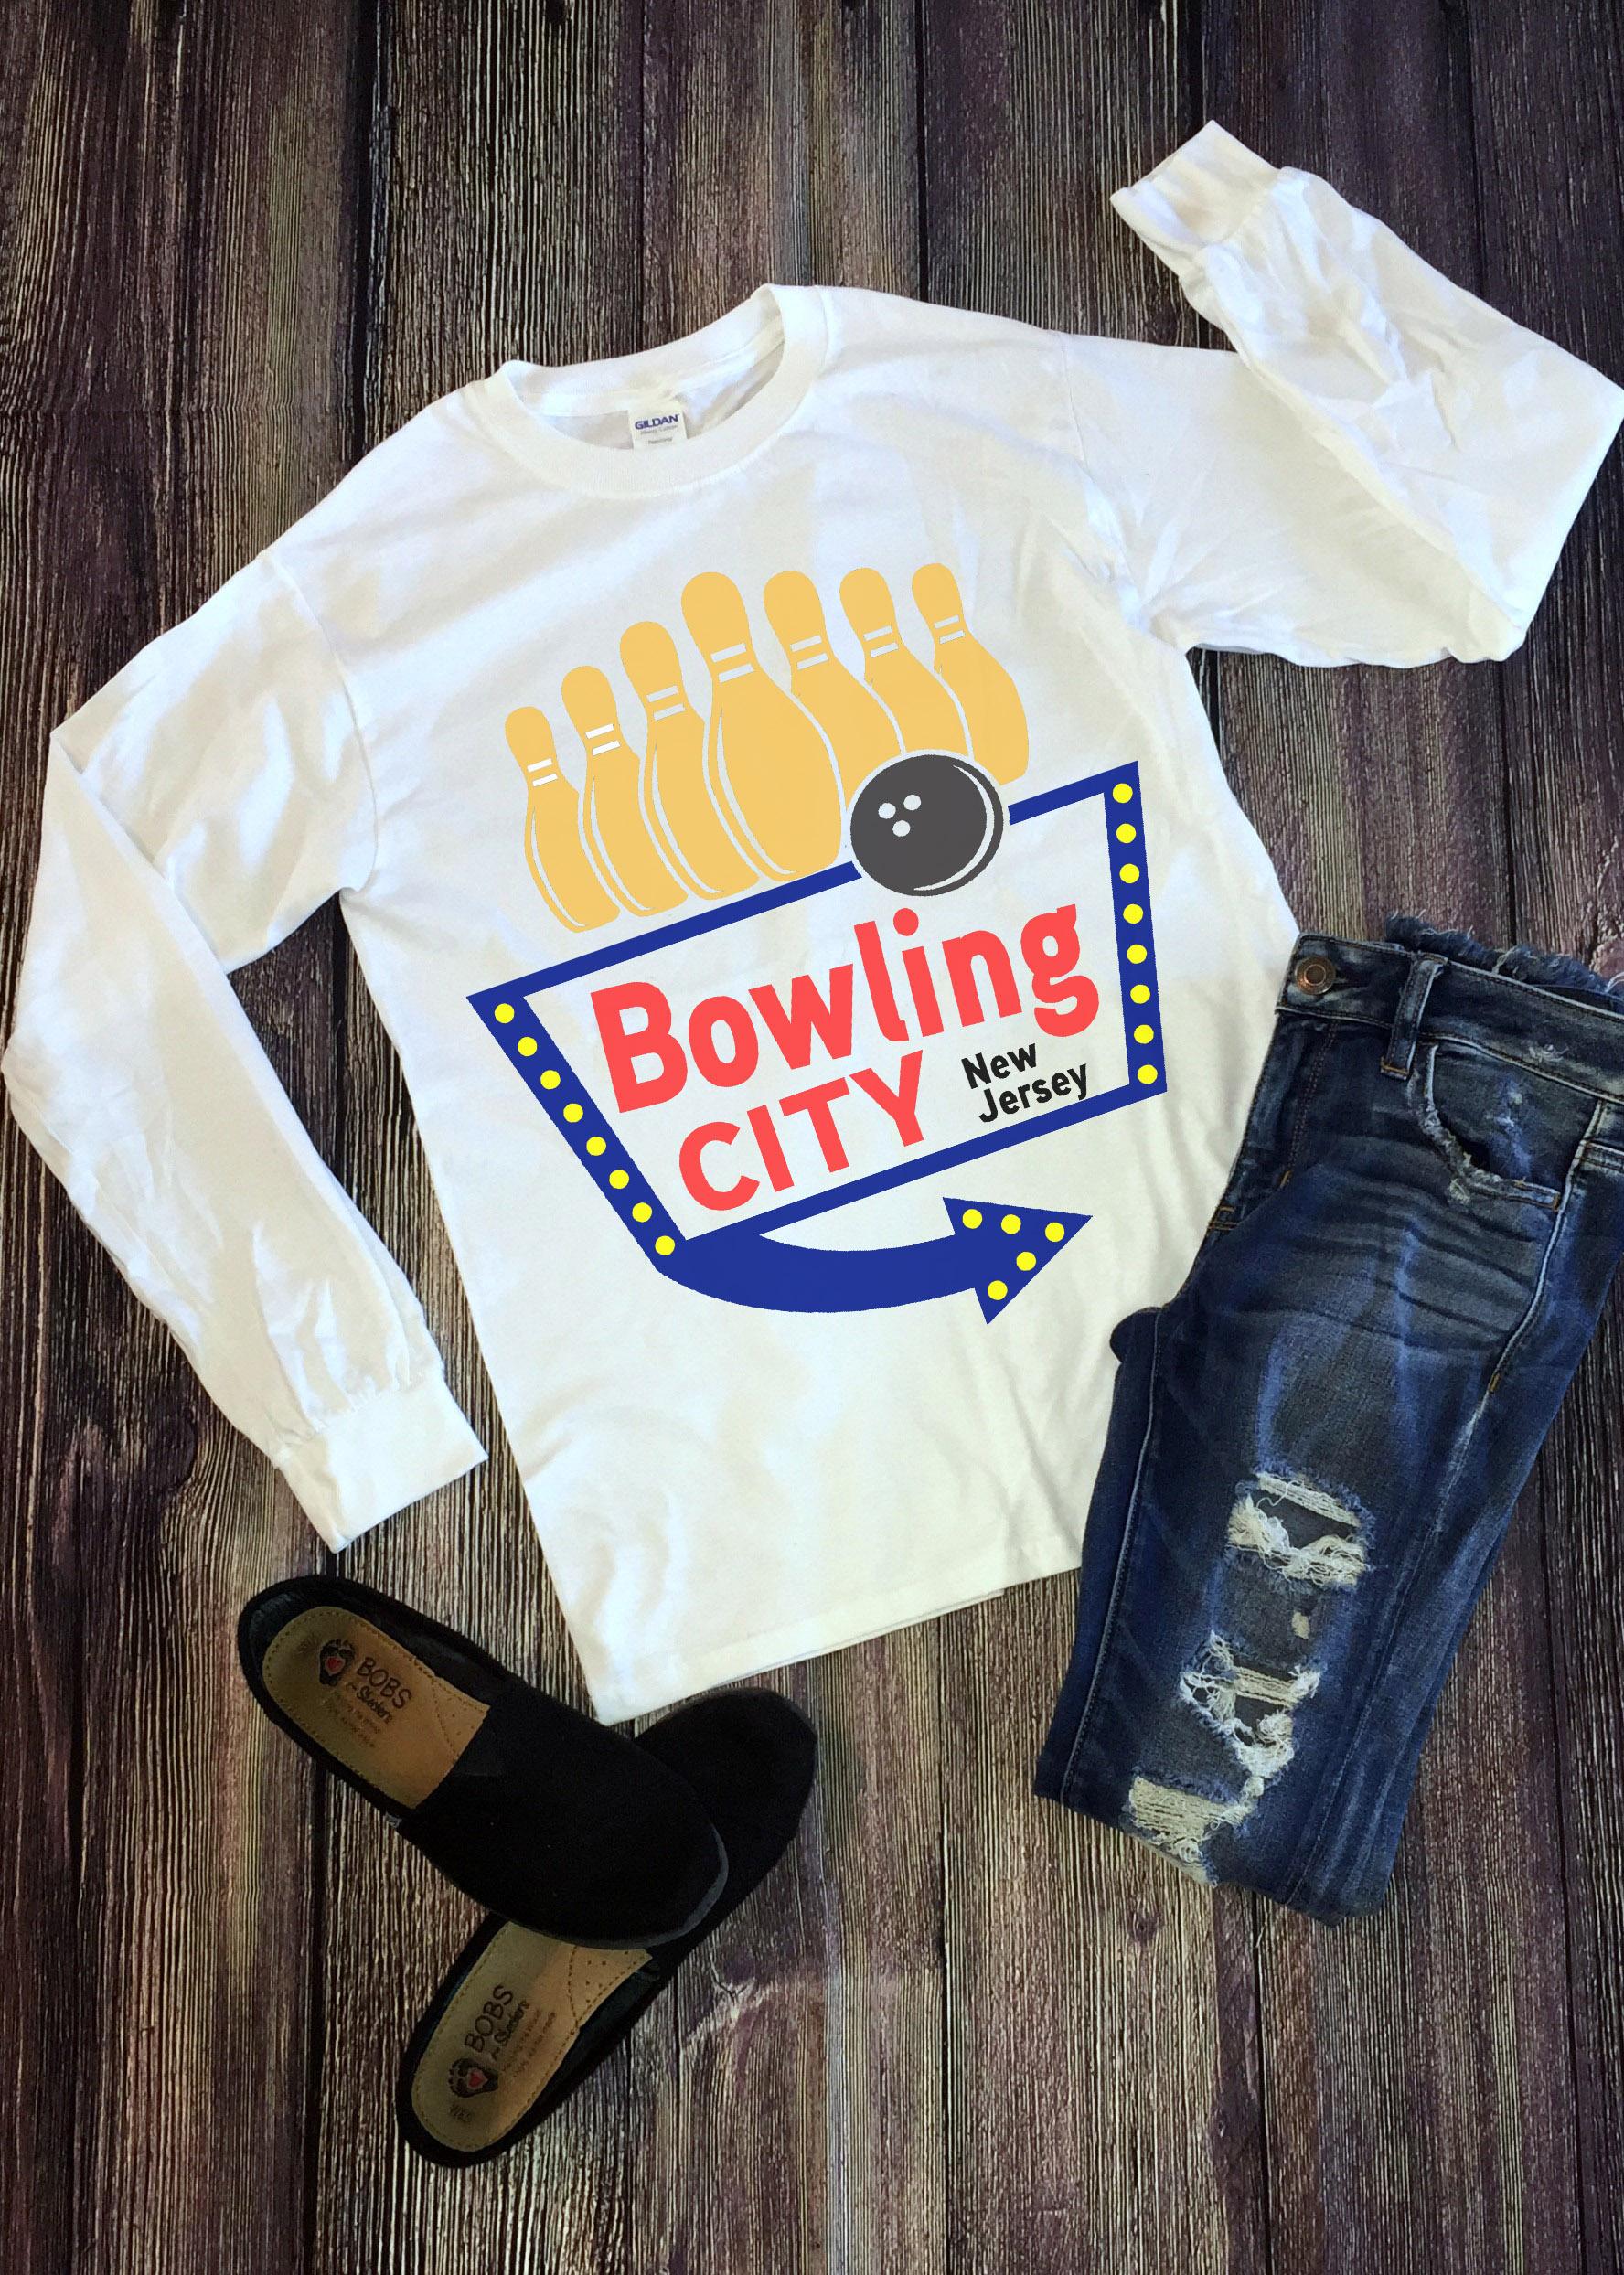 Free Bowling City SVG File